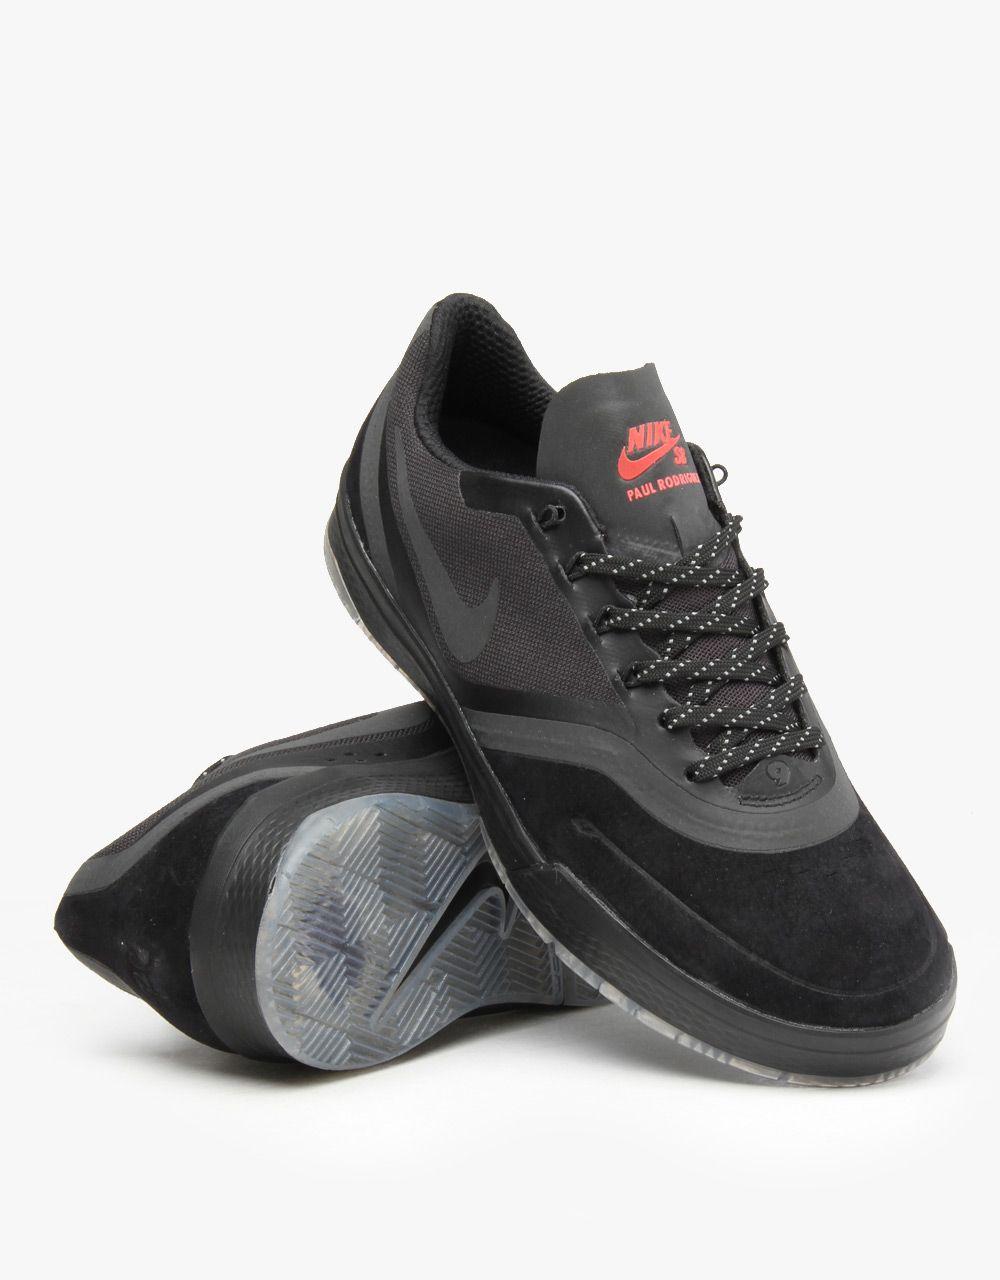 Nike SB Paul Rodriguez 9 Elite Flash Black